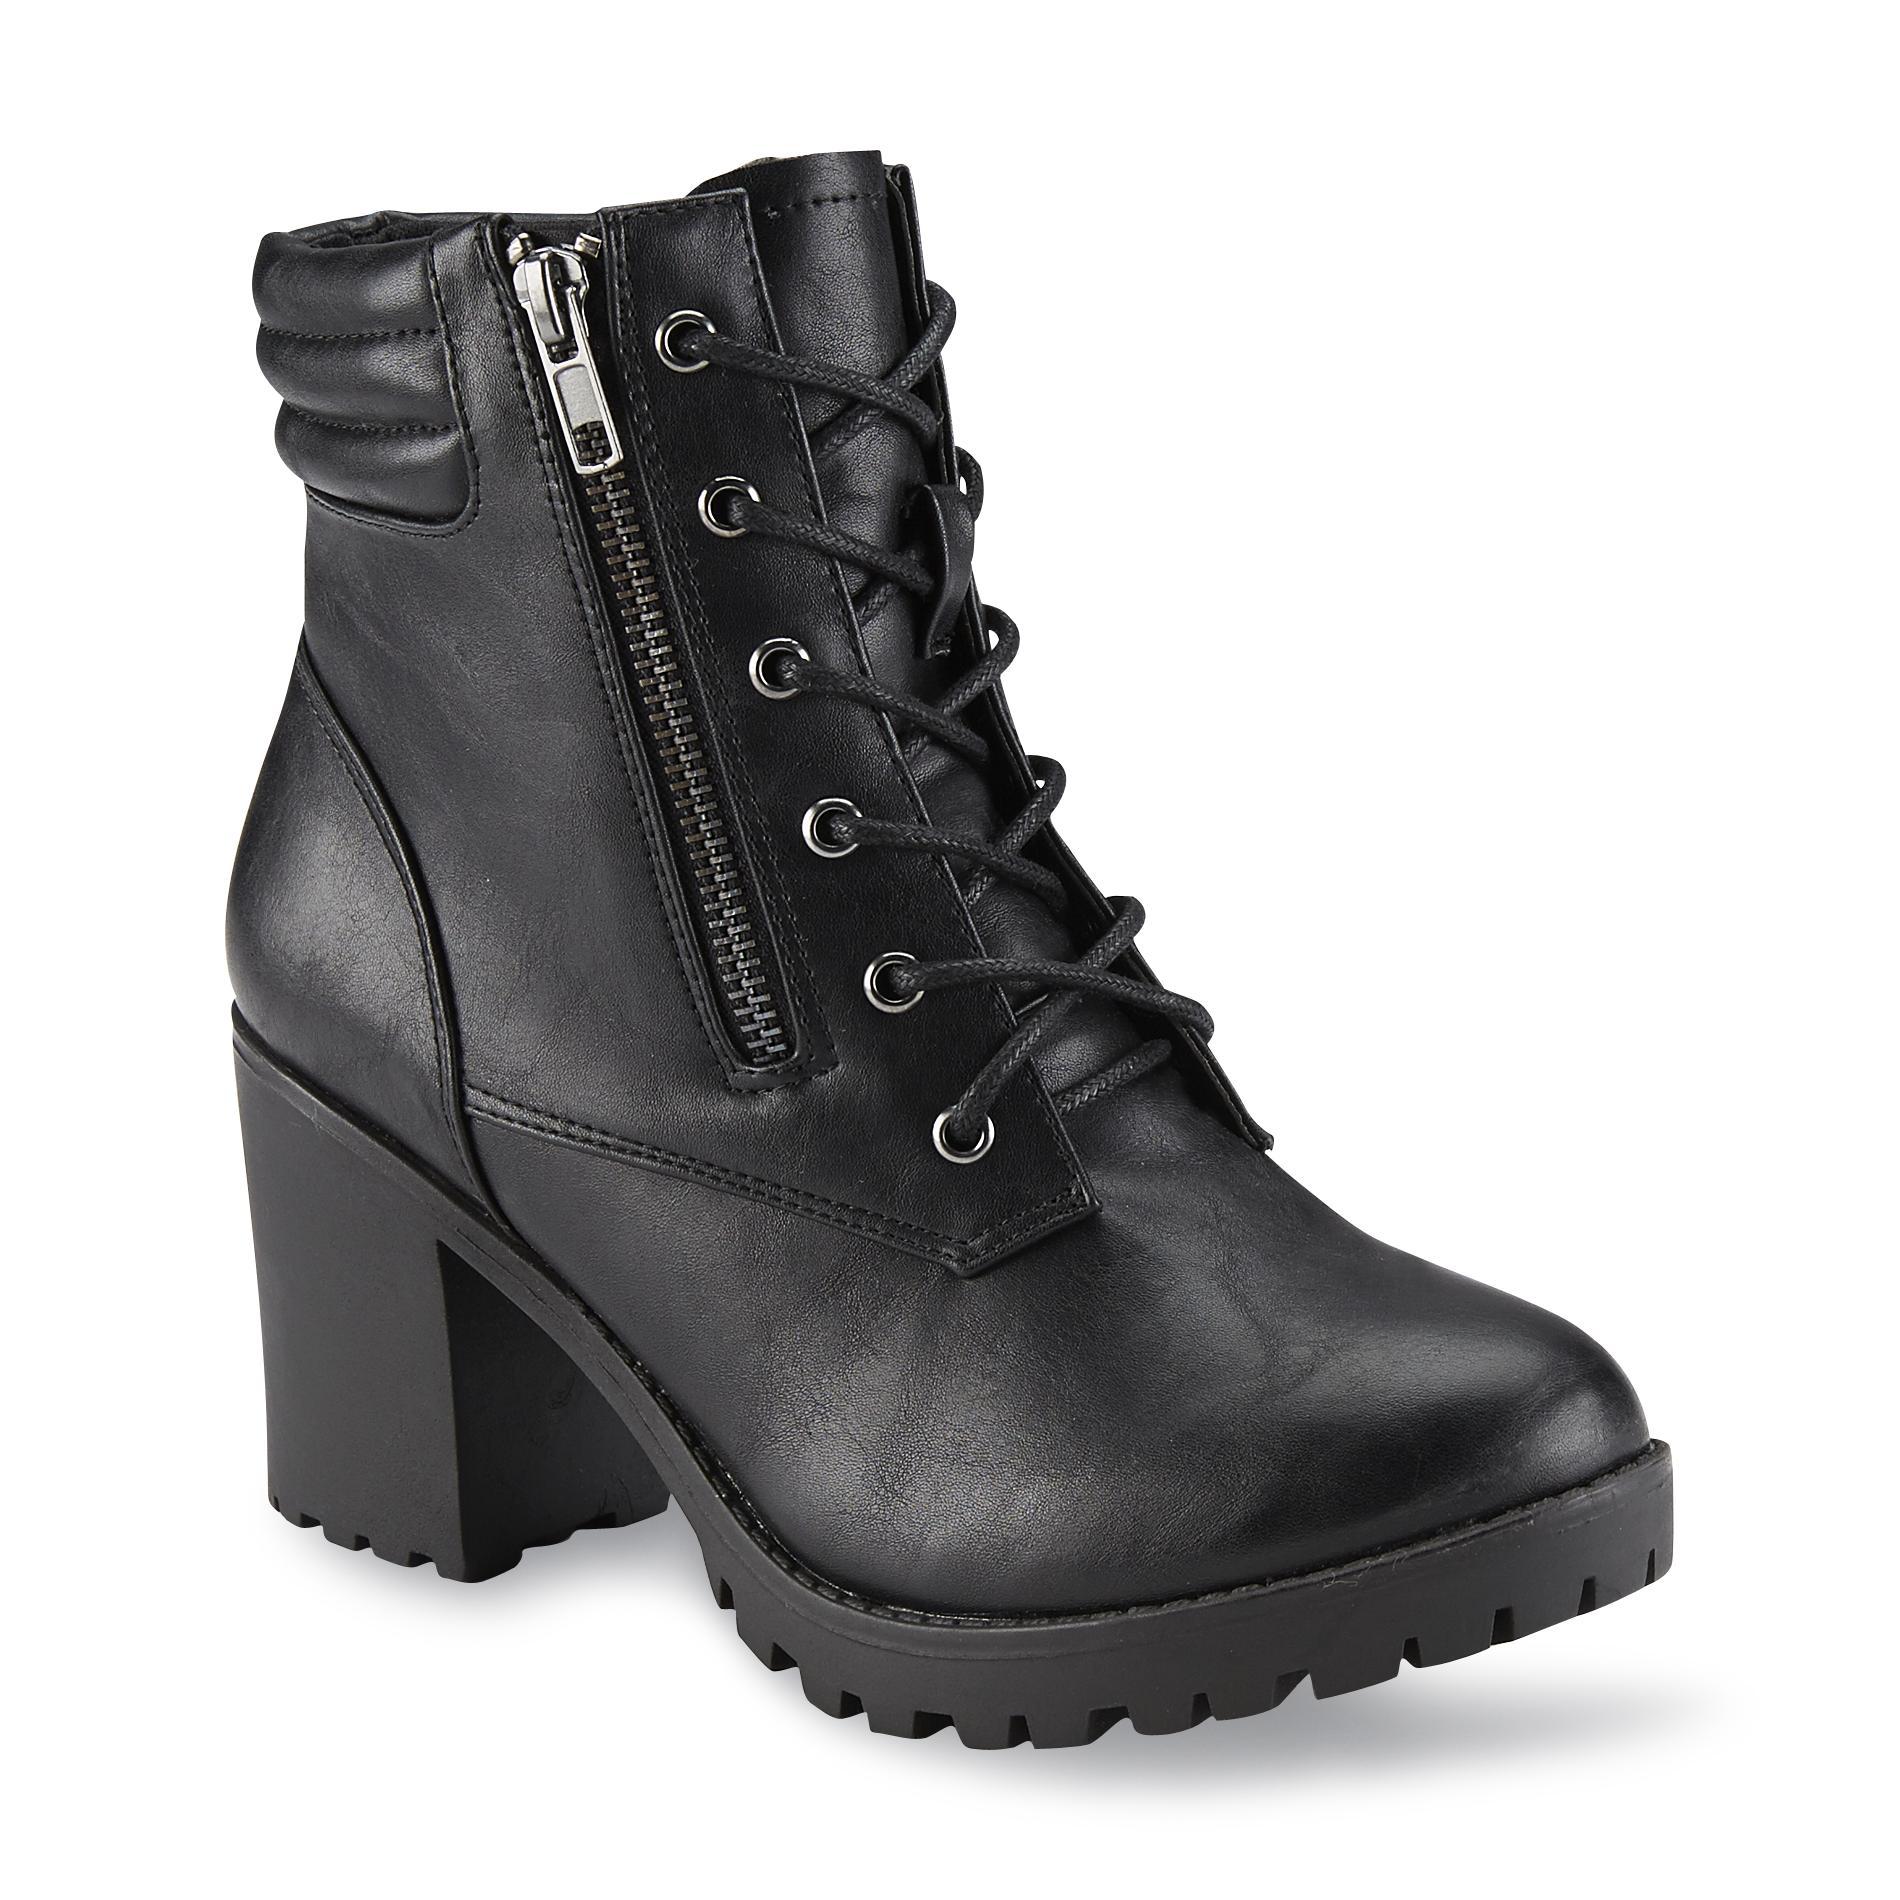 Bongo Women' Cali Black Platform Moto Boot - Shoes Boots